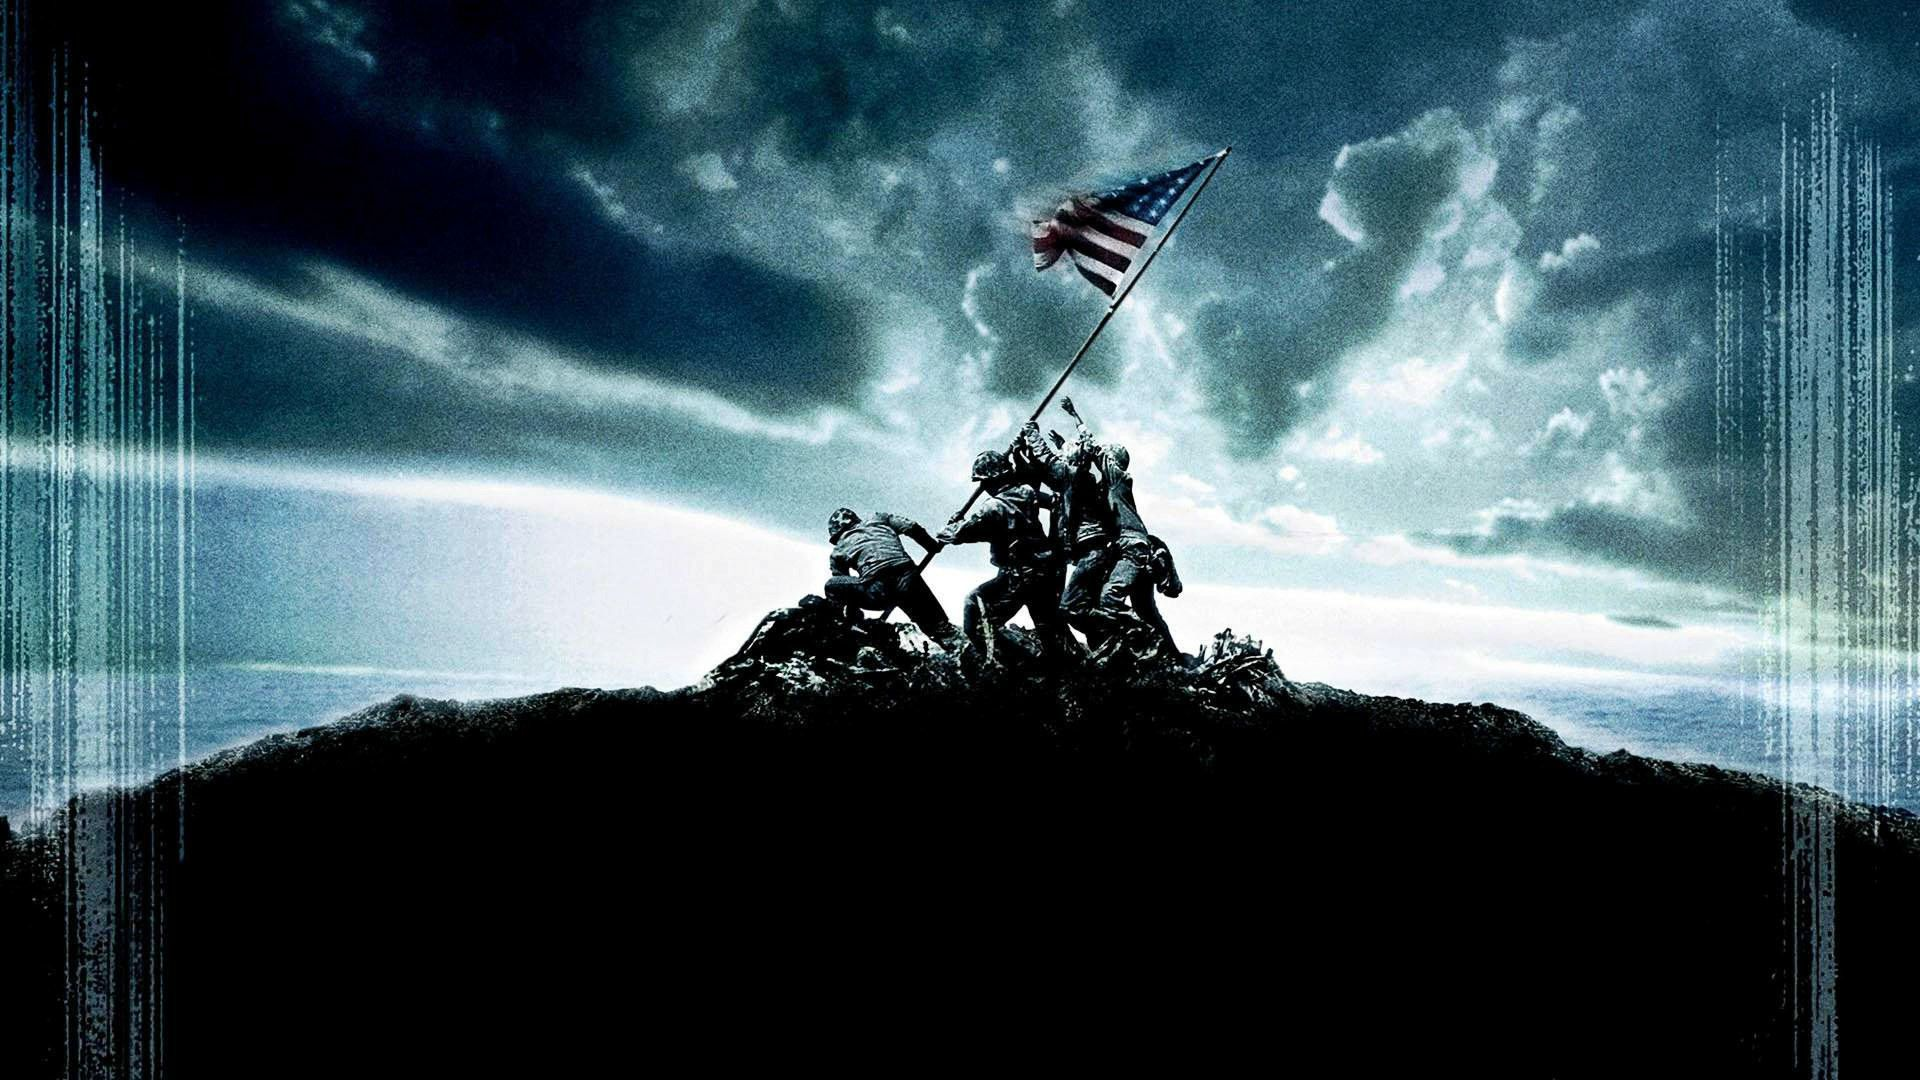 Marine Corps Desktop Wallpapers - Top Free Marine Corps ...